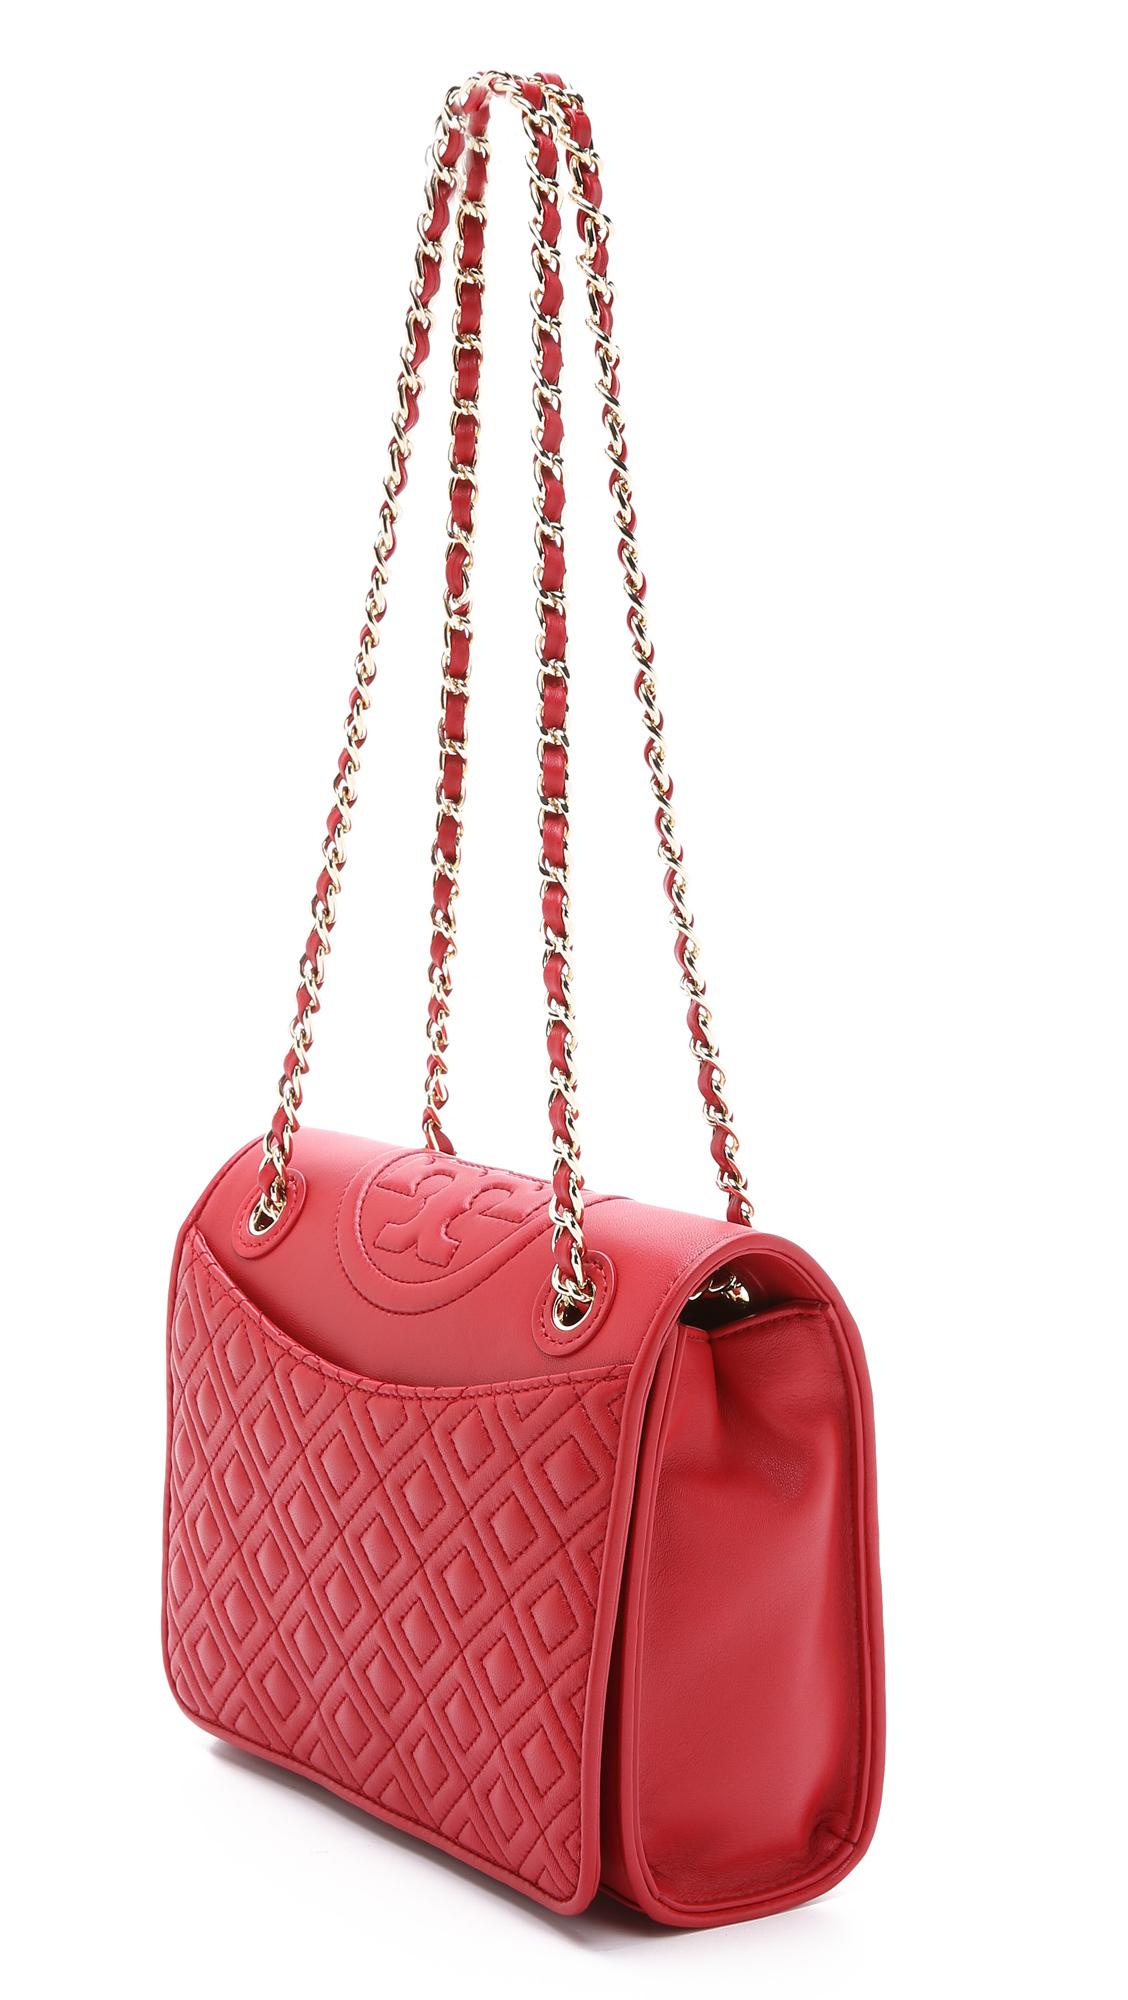 Tory Burch Fleming Medium Shoulder Bag In Red Lyst